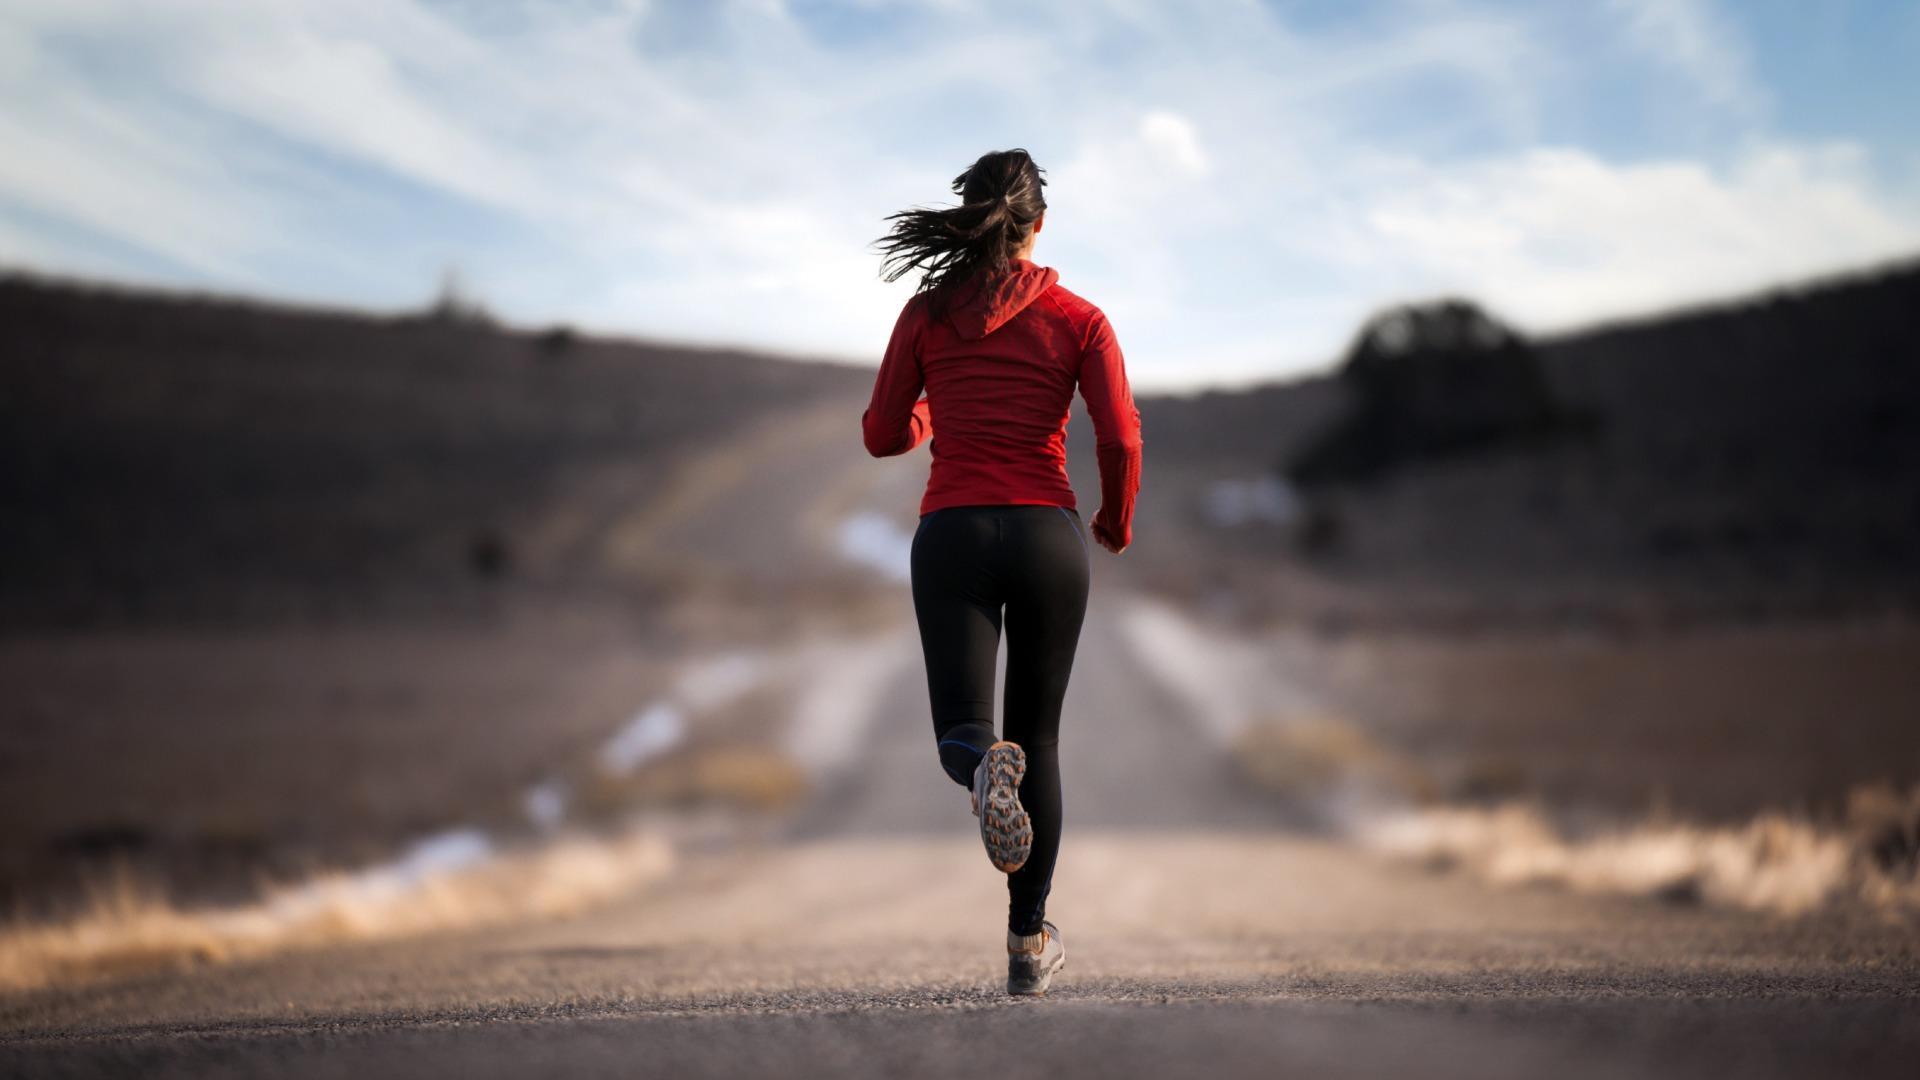 Обои спорт бег на рабочий стол